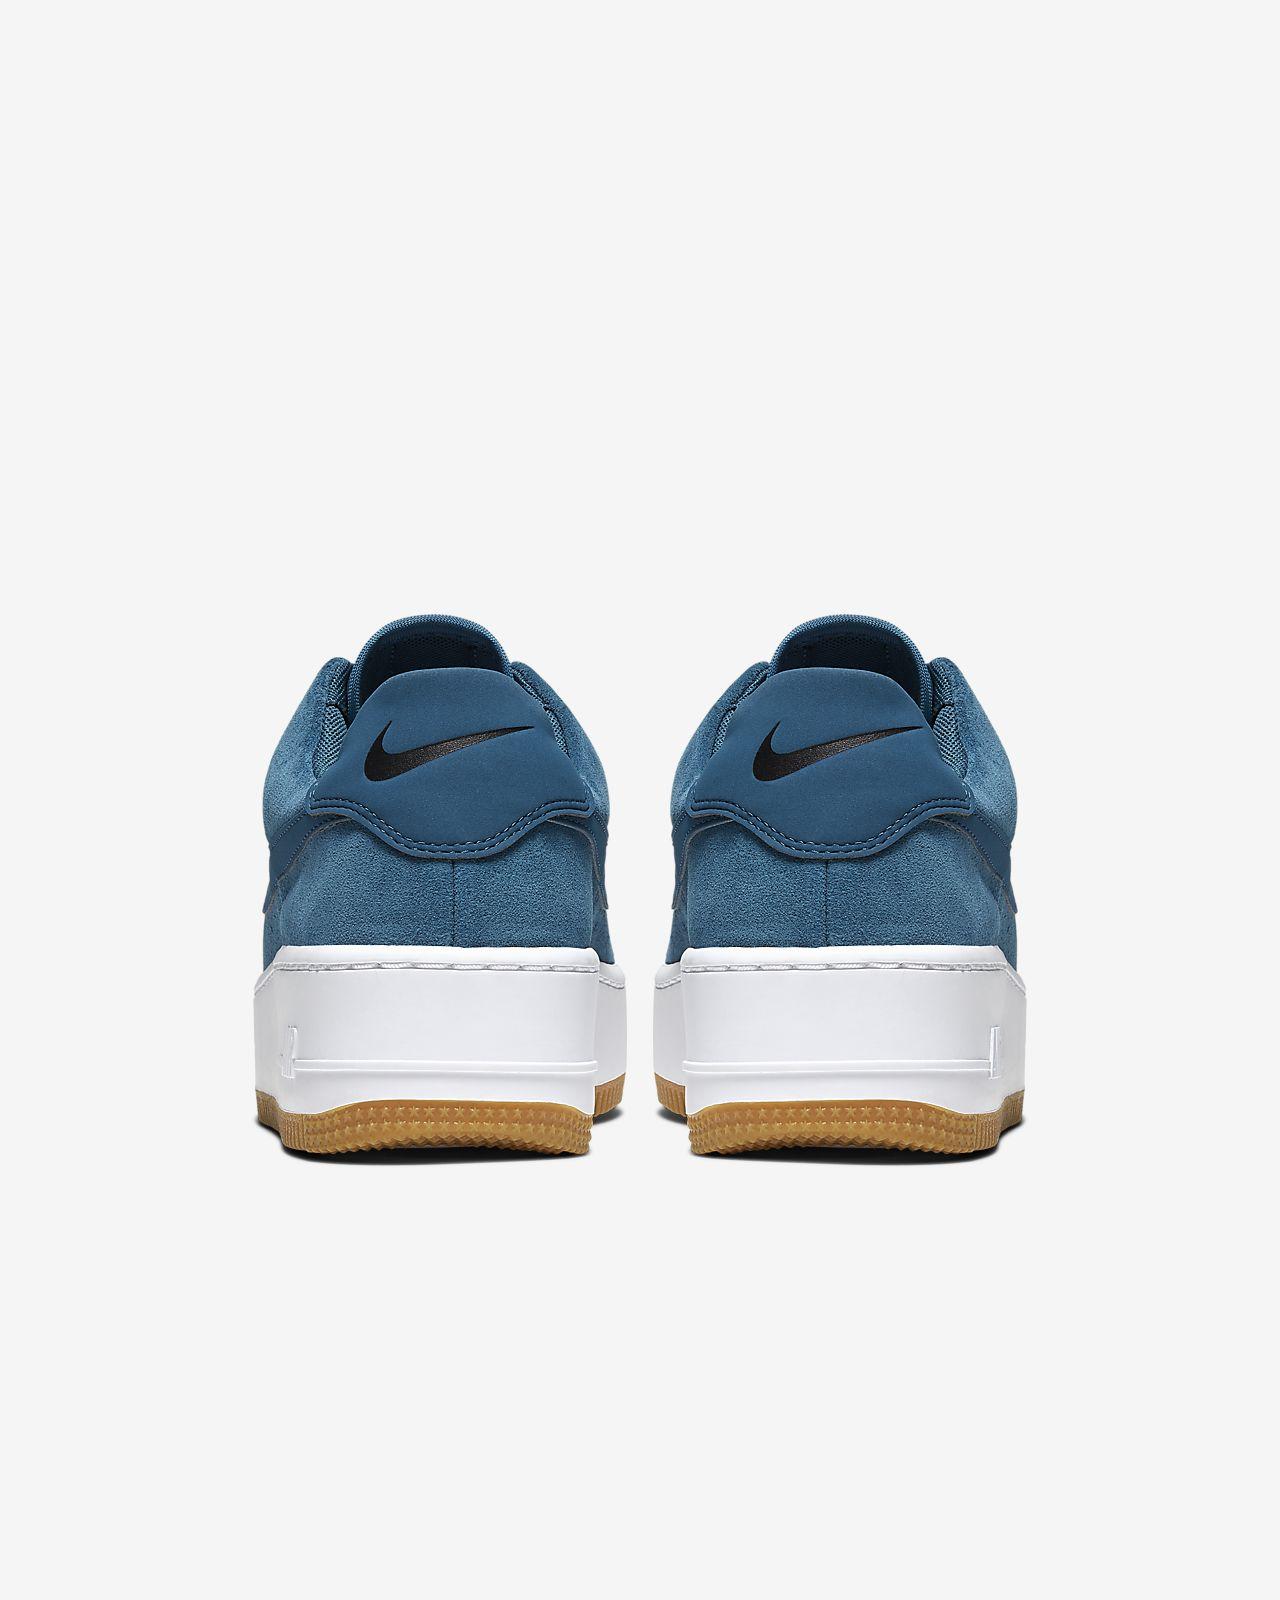 2 Paar Sportschuhe, Größe 35,5 Nike Zoom Breathe Lunarlite